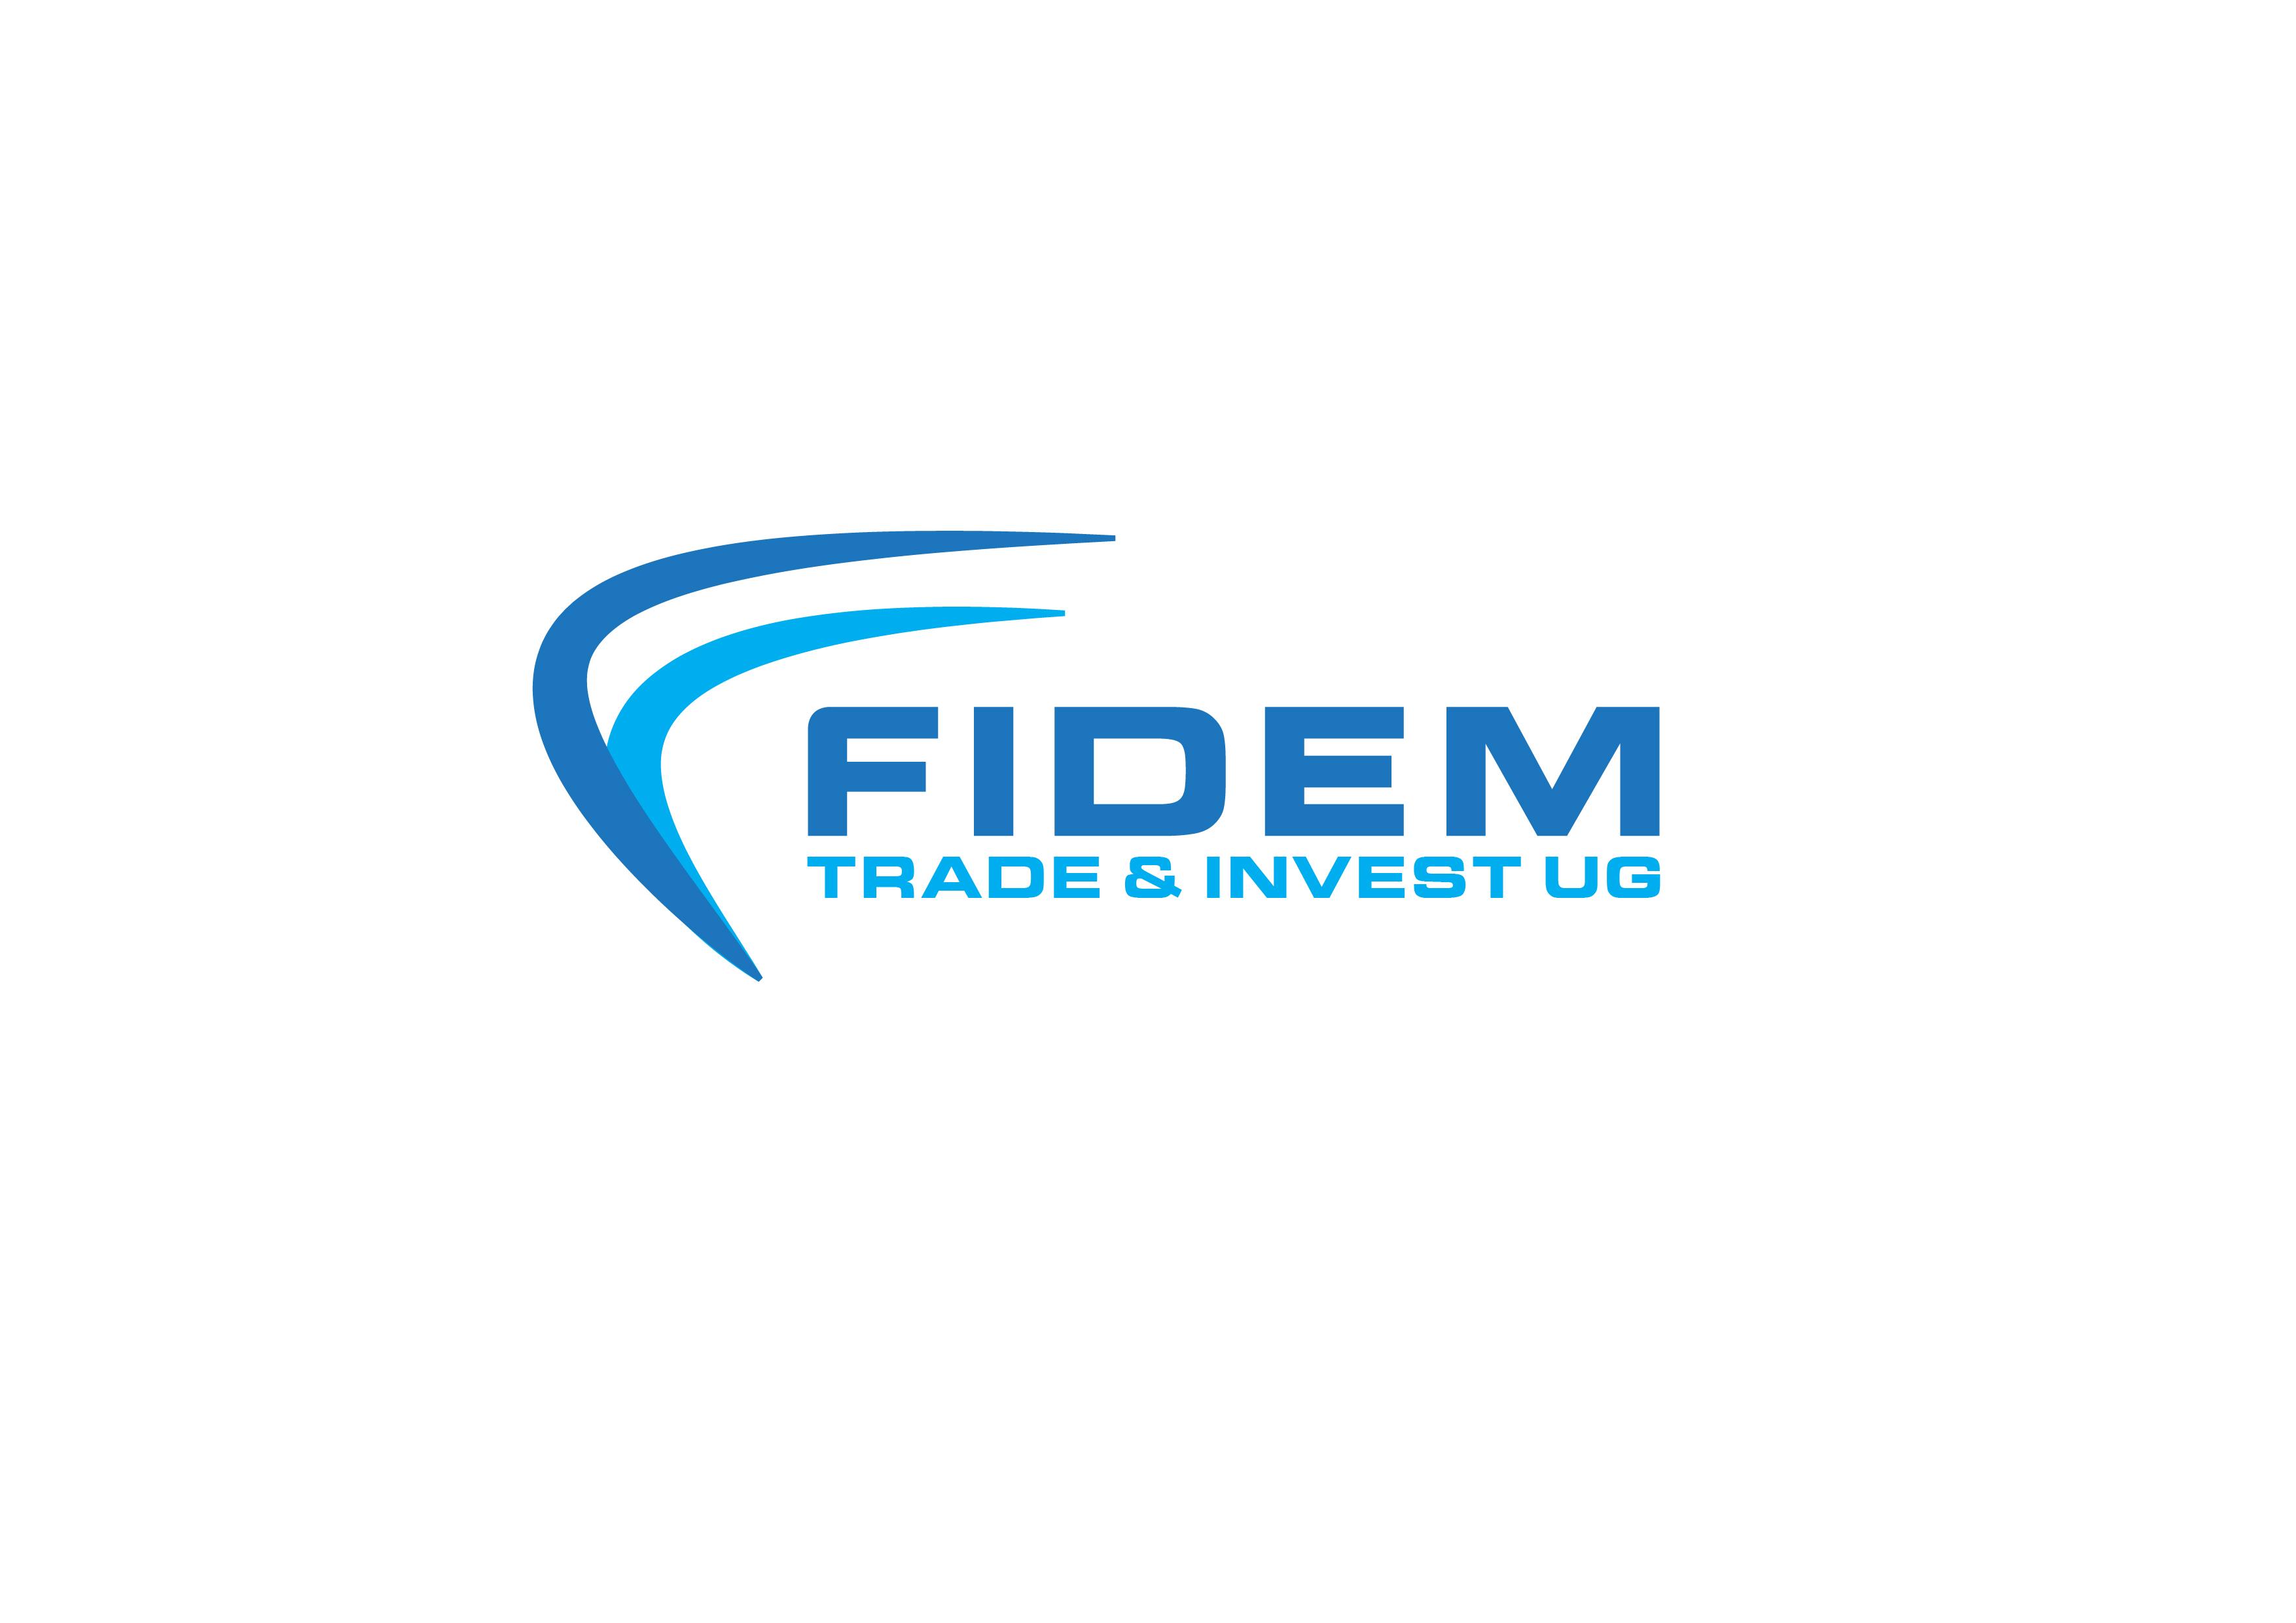 Logo Design by 3draw - Entry No. 770 in the Logo Design Contest Professional Logo Design for FIDEM Trade & Invest UG.